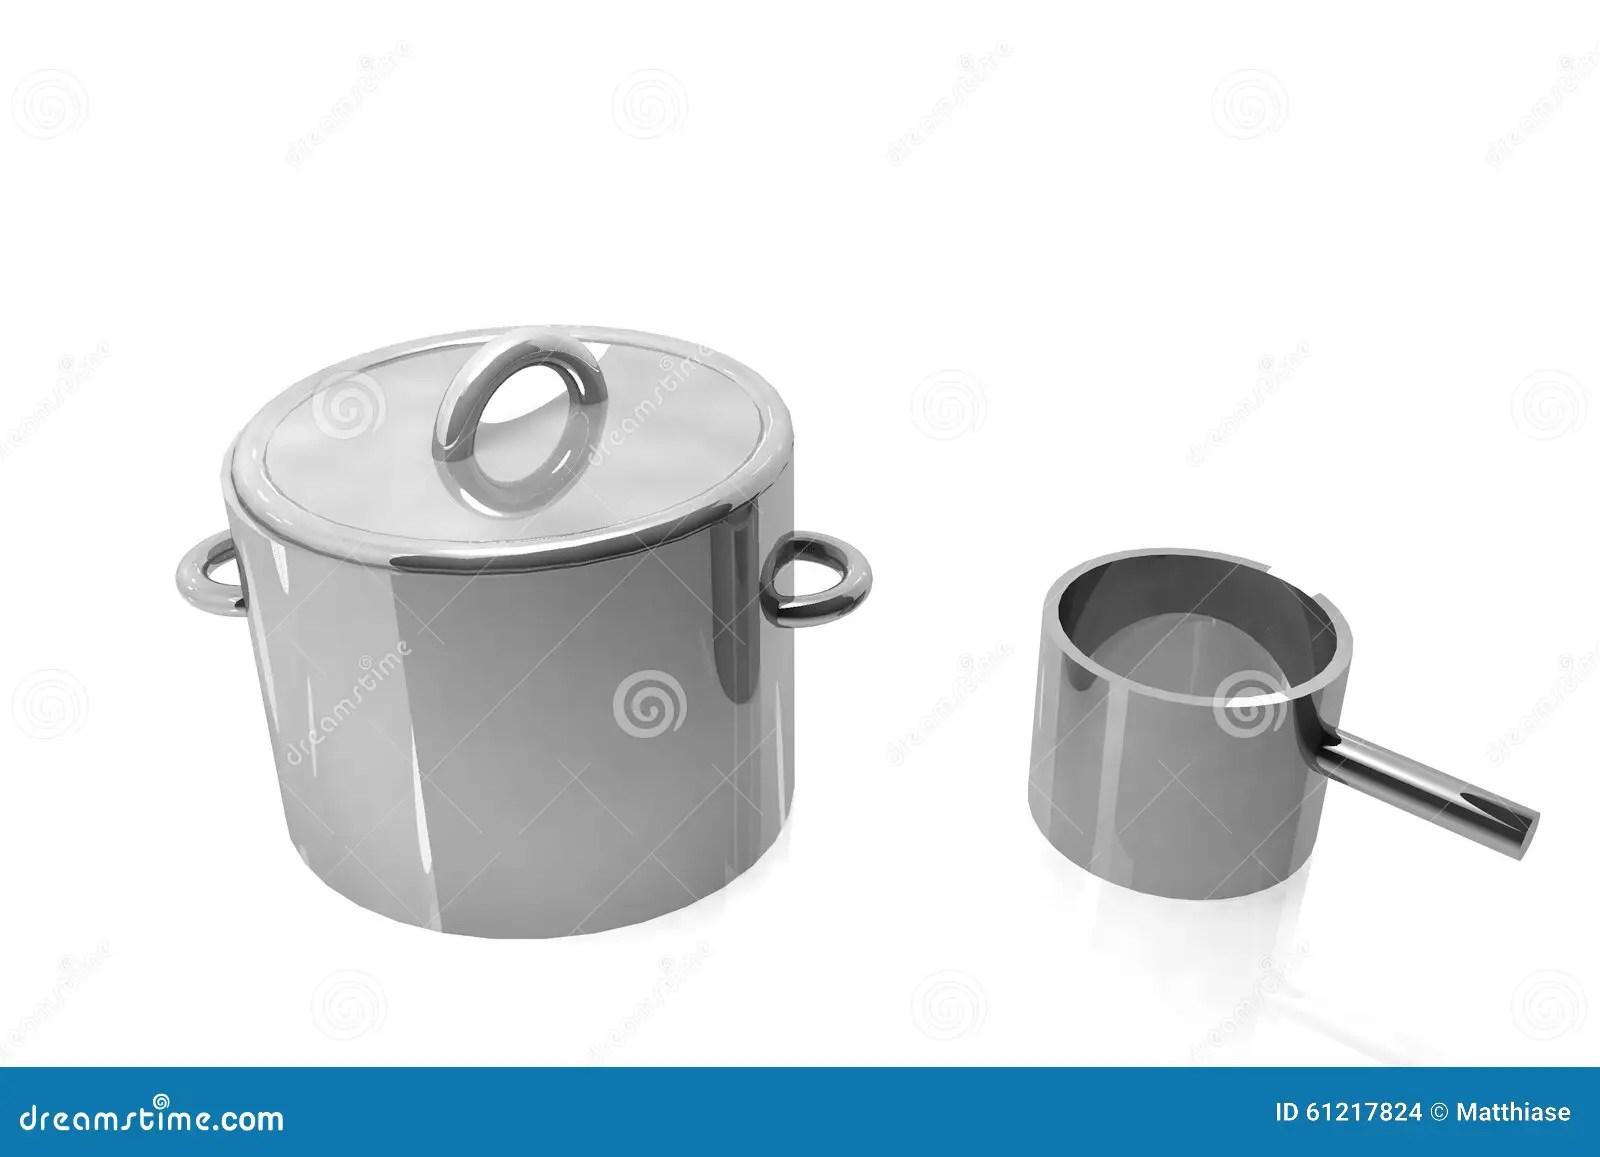 kitchen canister master forge outdoor 厨房罐3d 库存例证 插画包括有厨房 豪华 烹饪器材 空白 厨具 对象